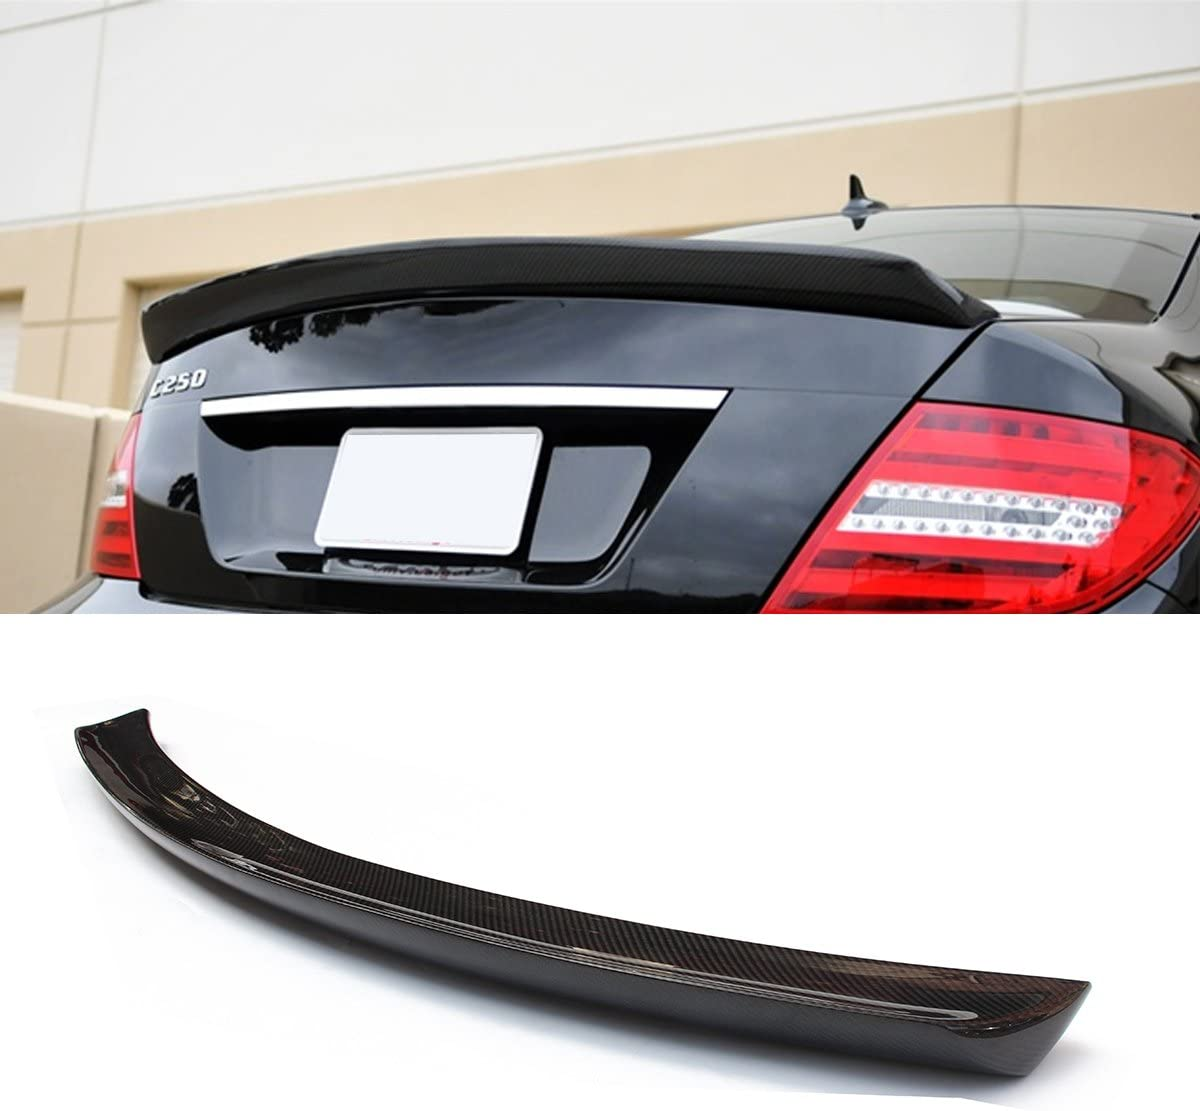 Fandixin W204 Spoiler AMG Style Carbon Fiber Rear Trunk Deck Lip Boot Spoiler Wing for Mercedes-Benz C Class W204 2-Door Coupe 2012-2016